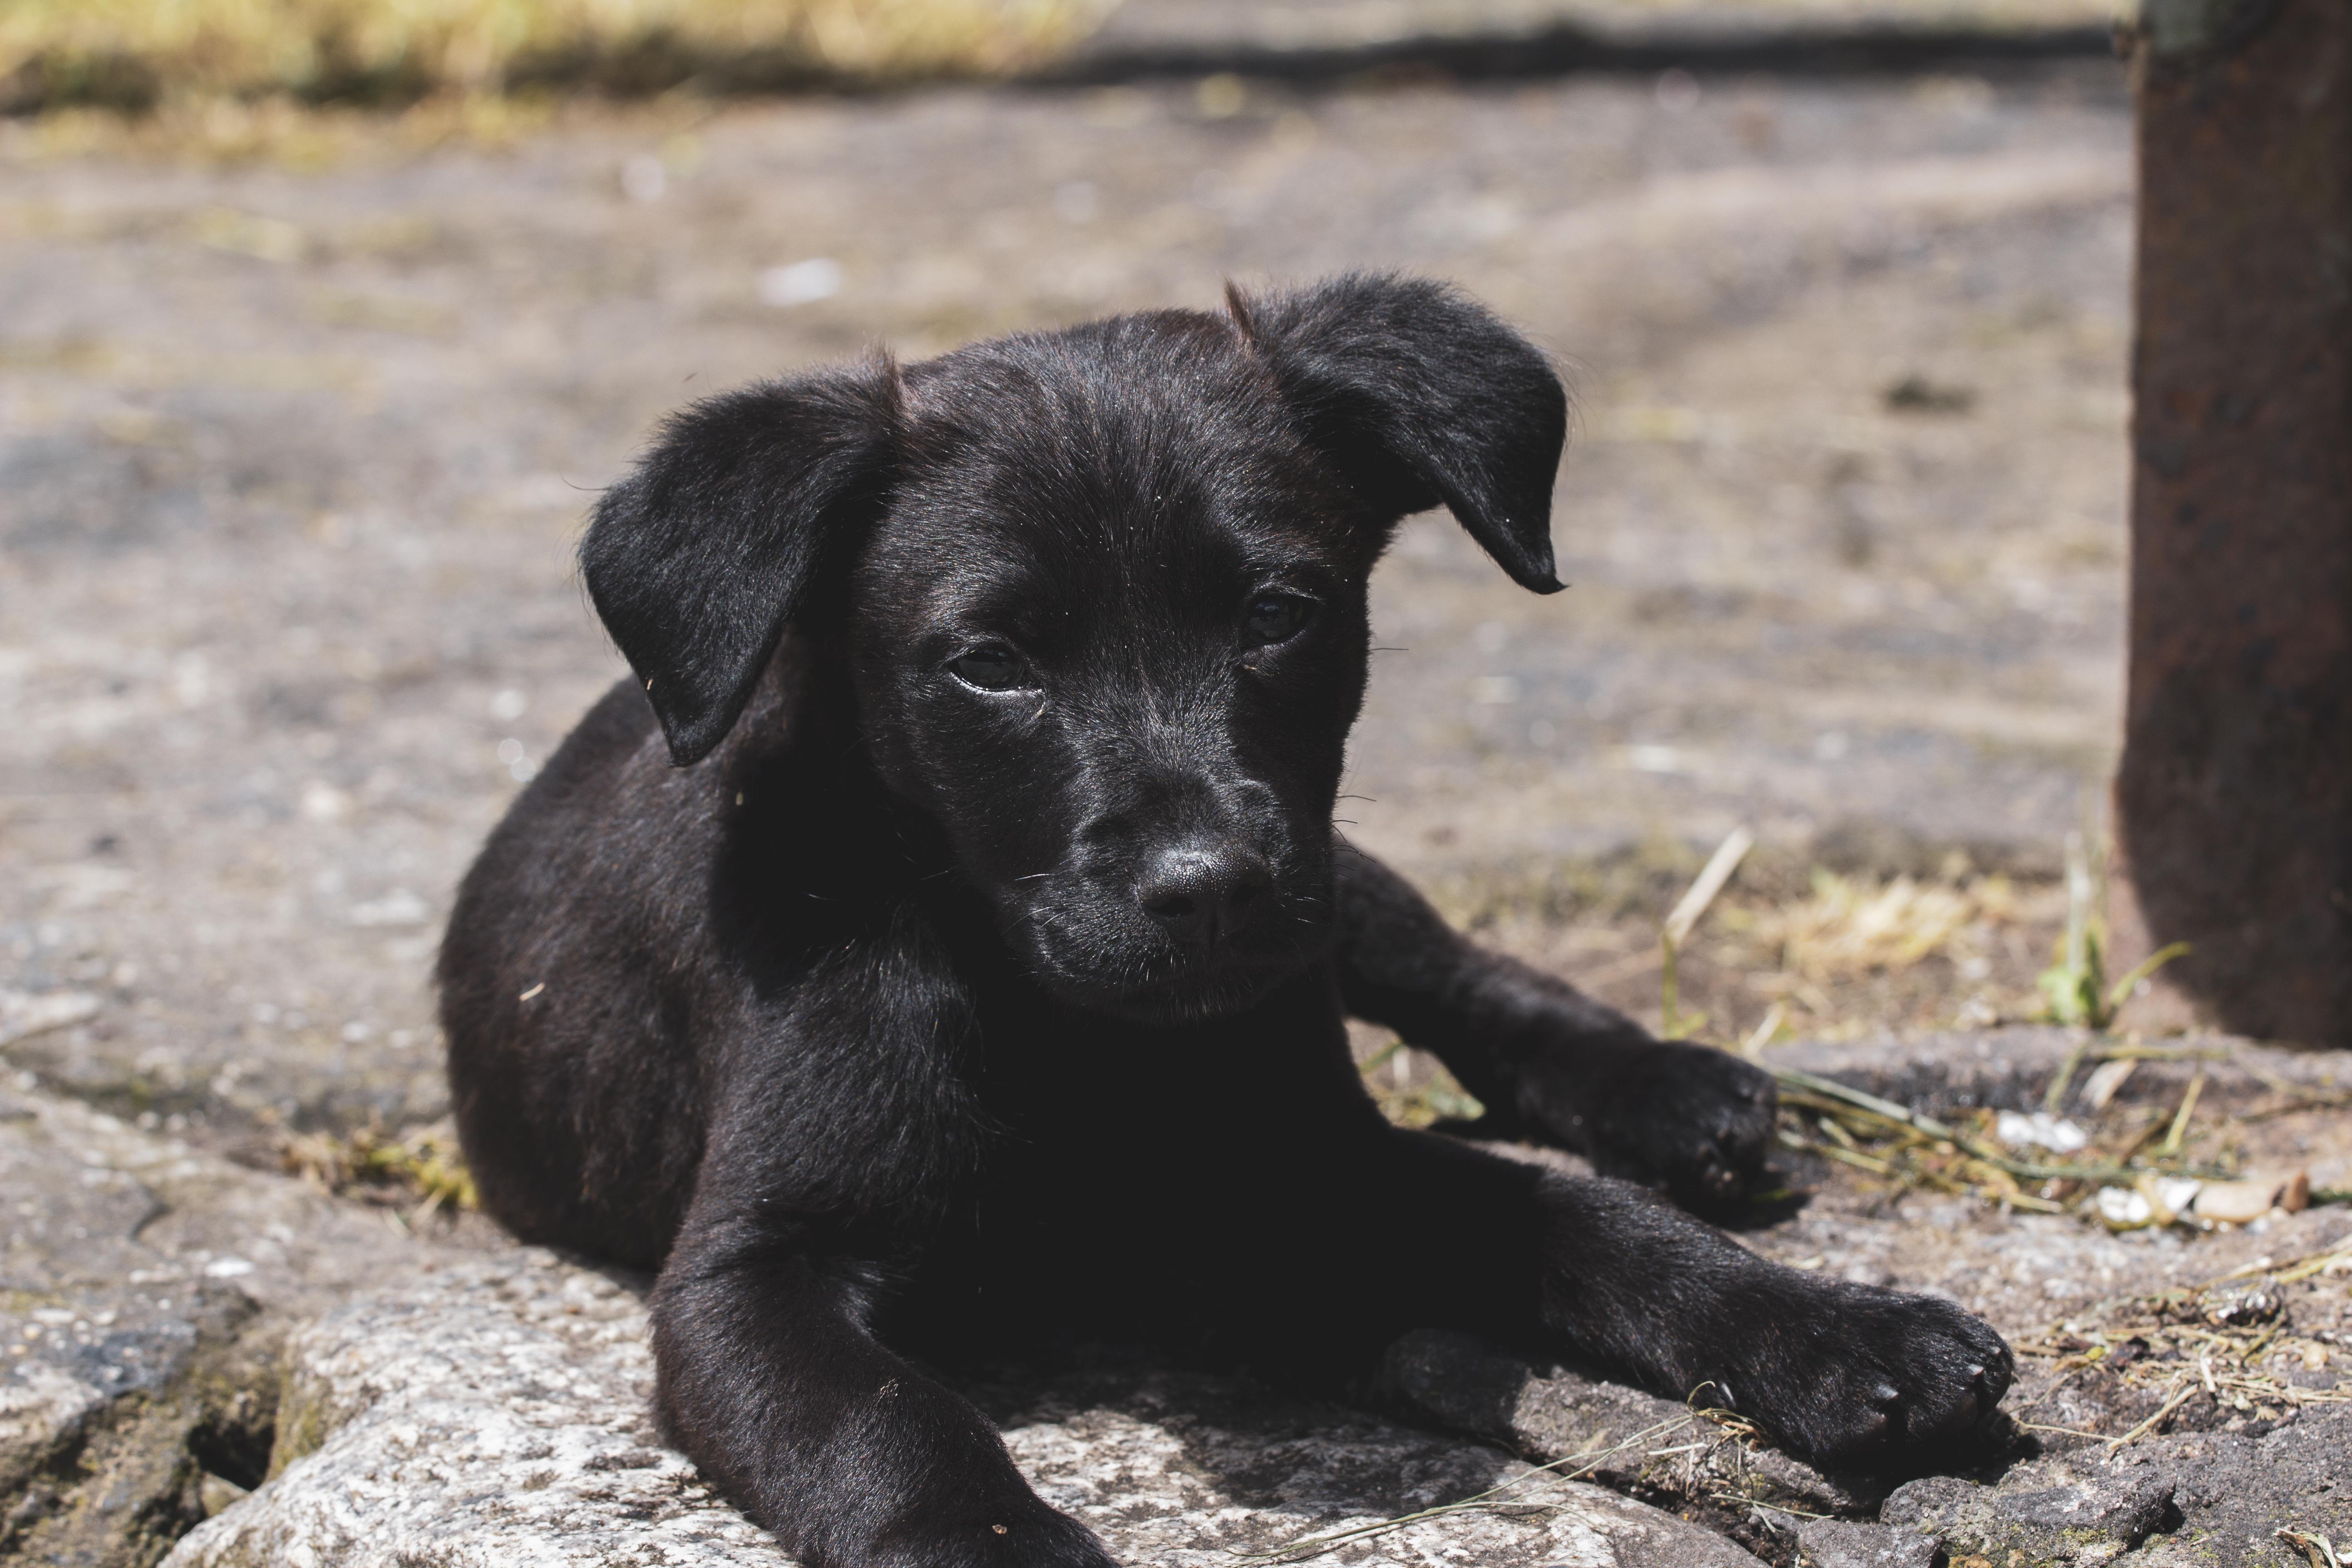 Short-coated Black Puppy Lying on Ground